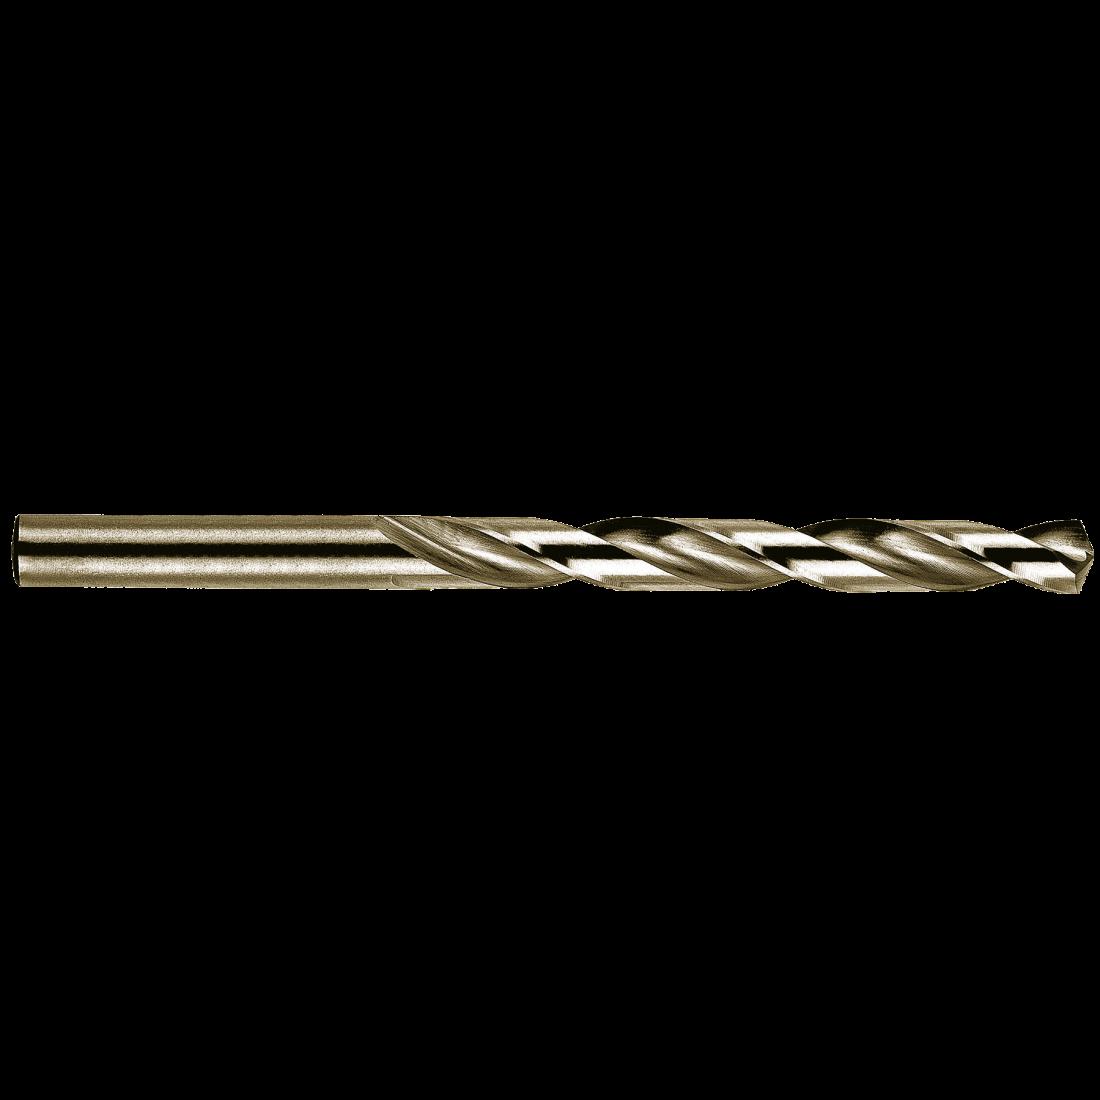 Сверло по металлу Heller НSS-Co DIN 338 RN  7,5x69x109мм (10шт)